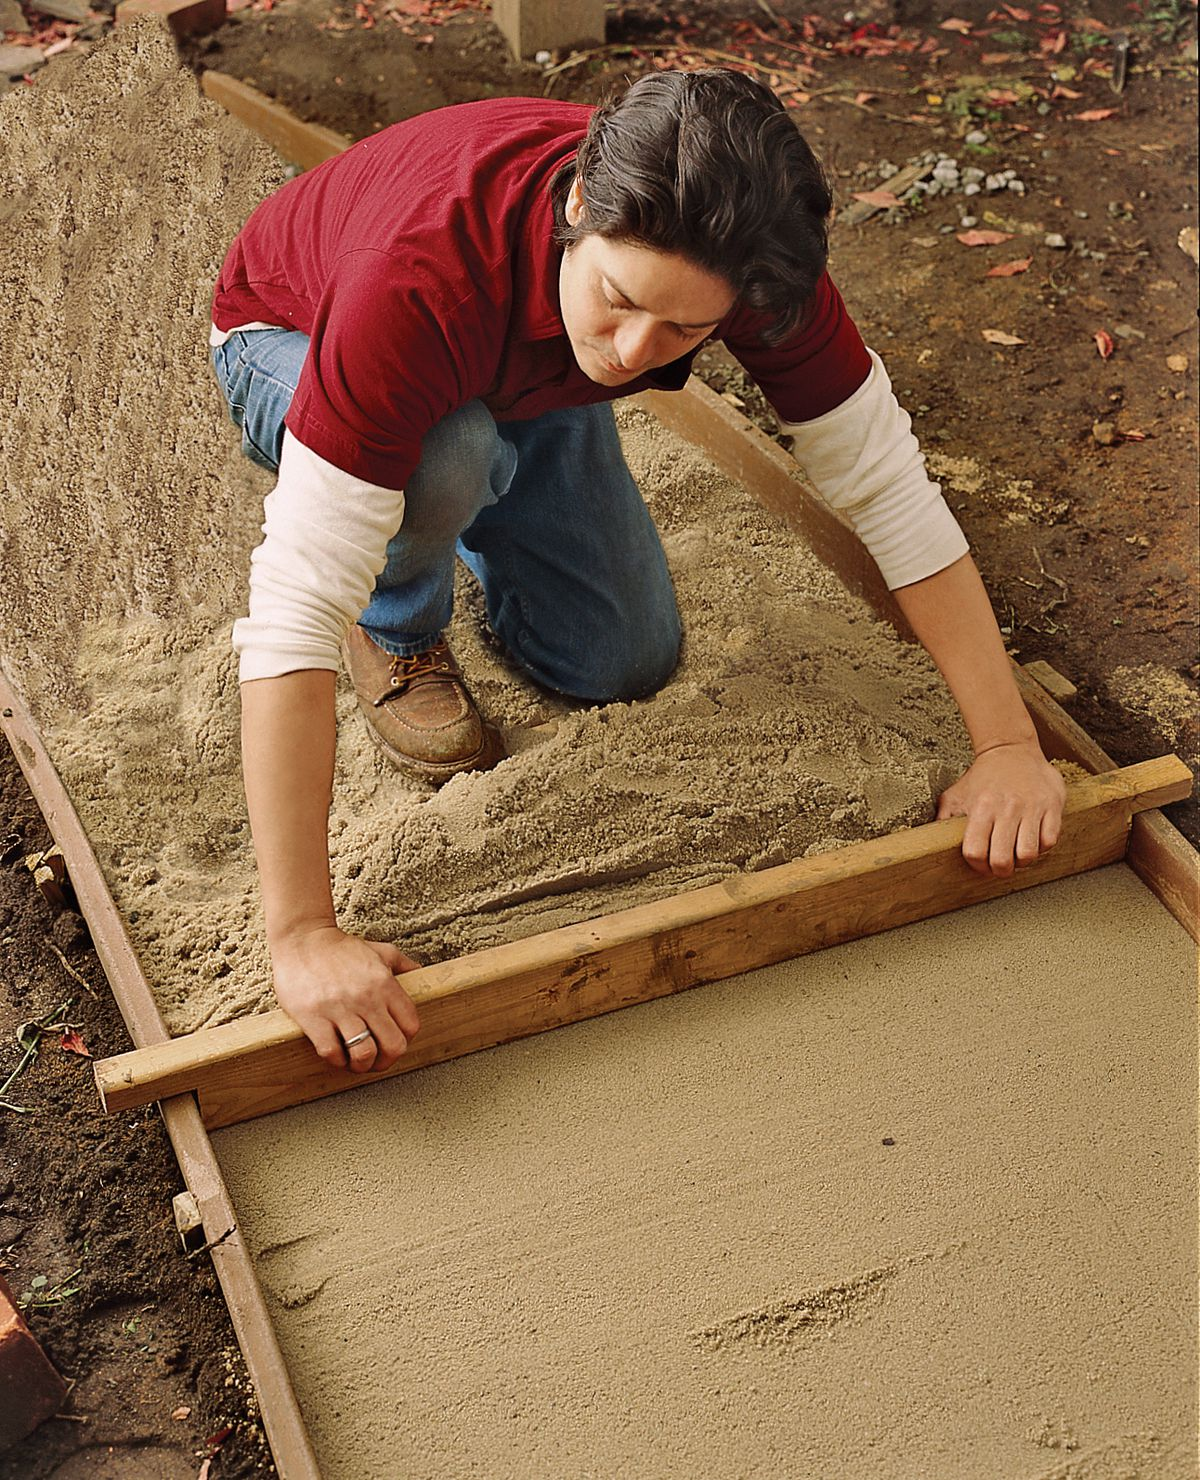 Man Adds Sand Layer To Brick Walkway